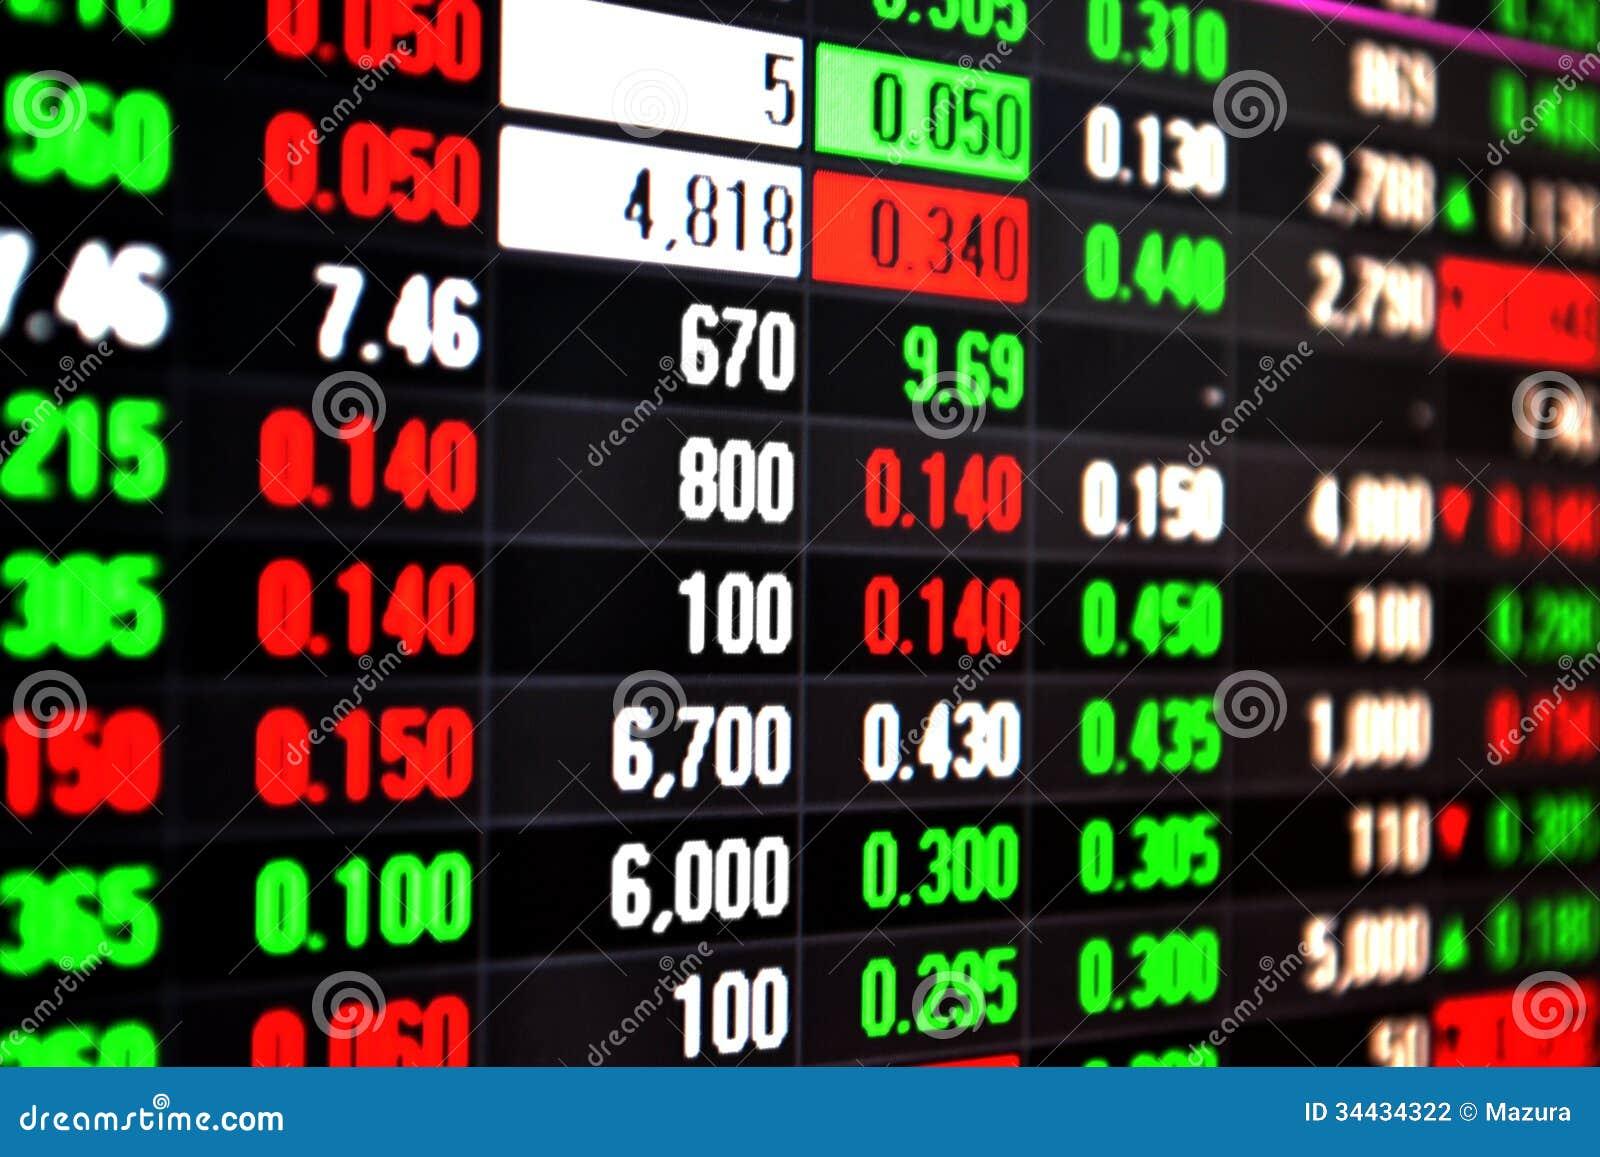 Investasi  Broker Forex Terbaik